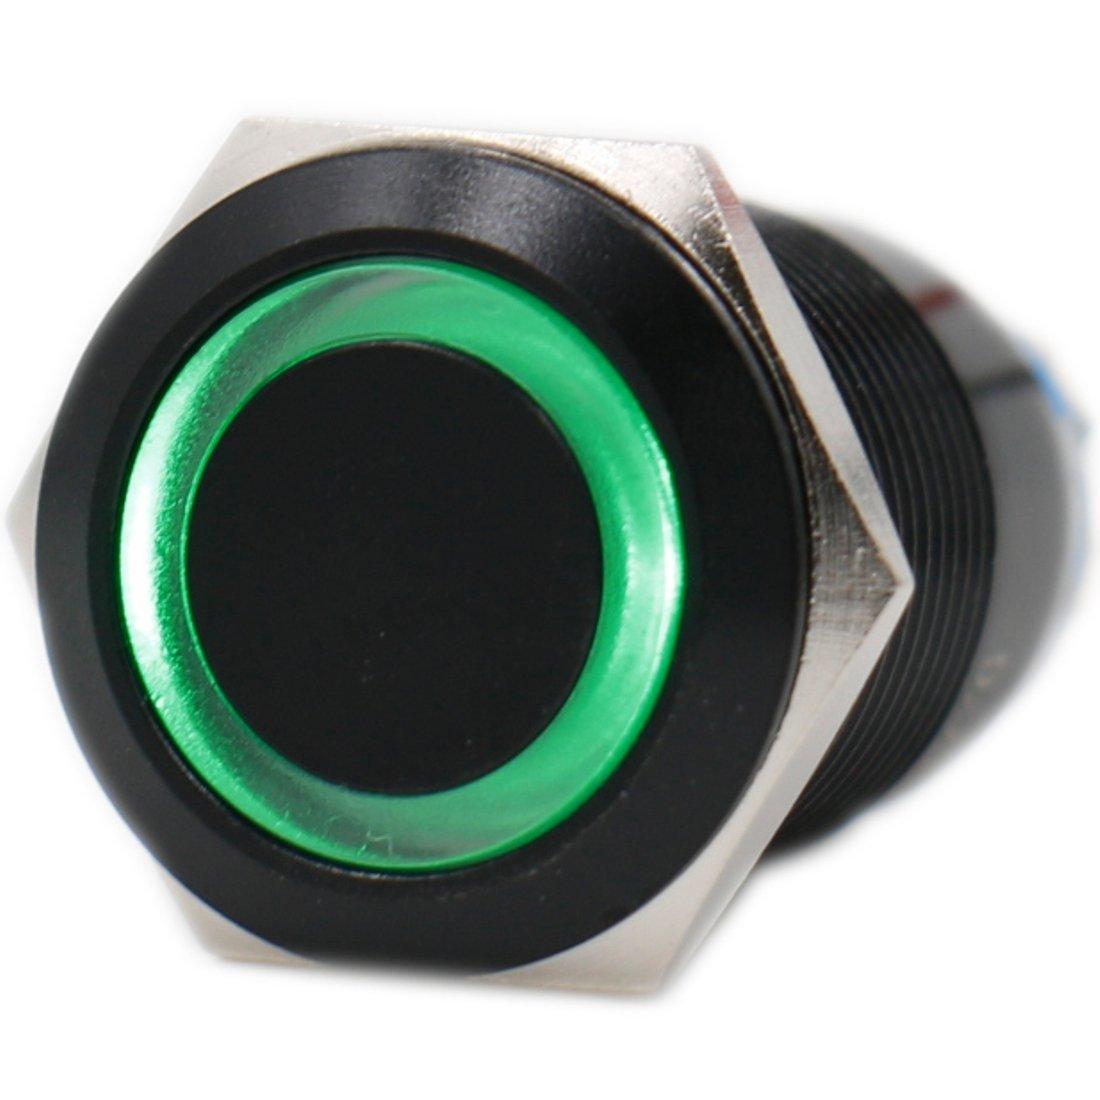 Heschen Black Metal Momentary Push Button Switch 19mm (3/4') 12 VDC Eagle Eye Green LED IP 67 Heschen Electric Co.Ltd HS19MG-12